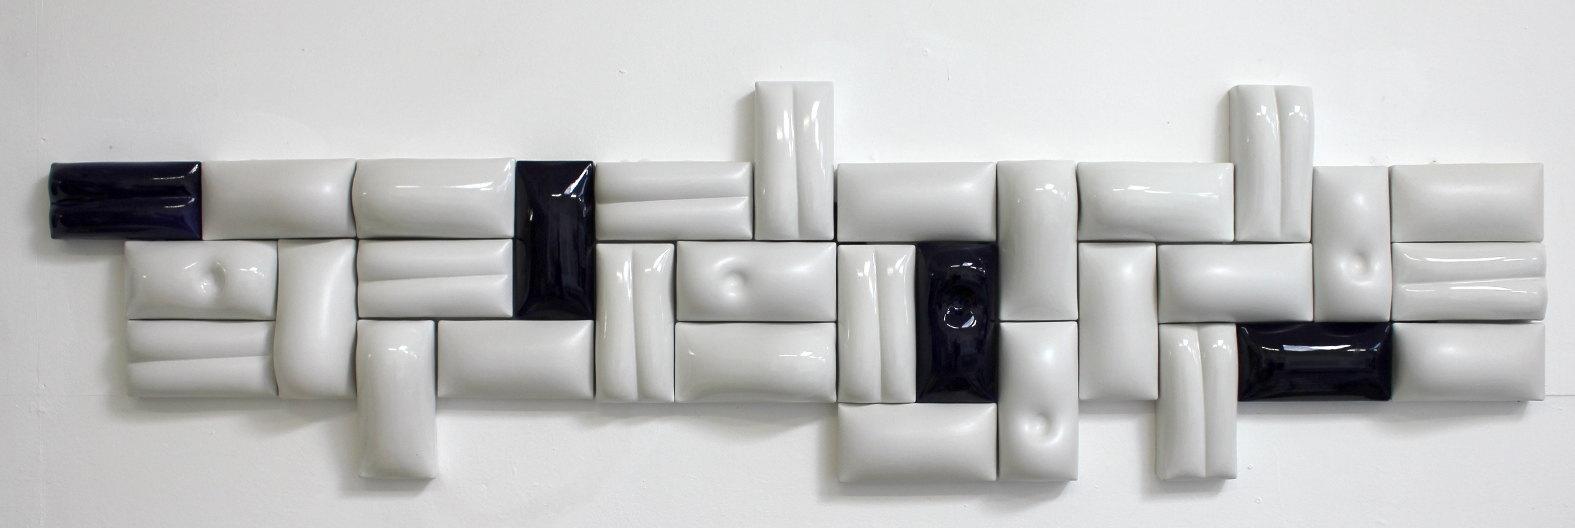 Wandrelief Keramik, Guido Kratz Hannover 08